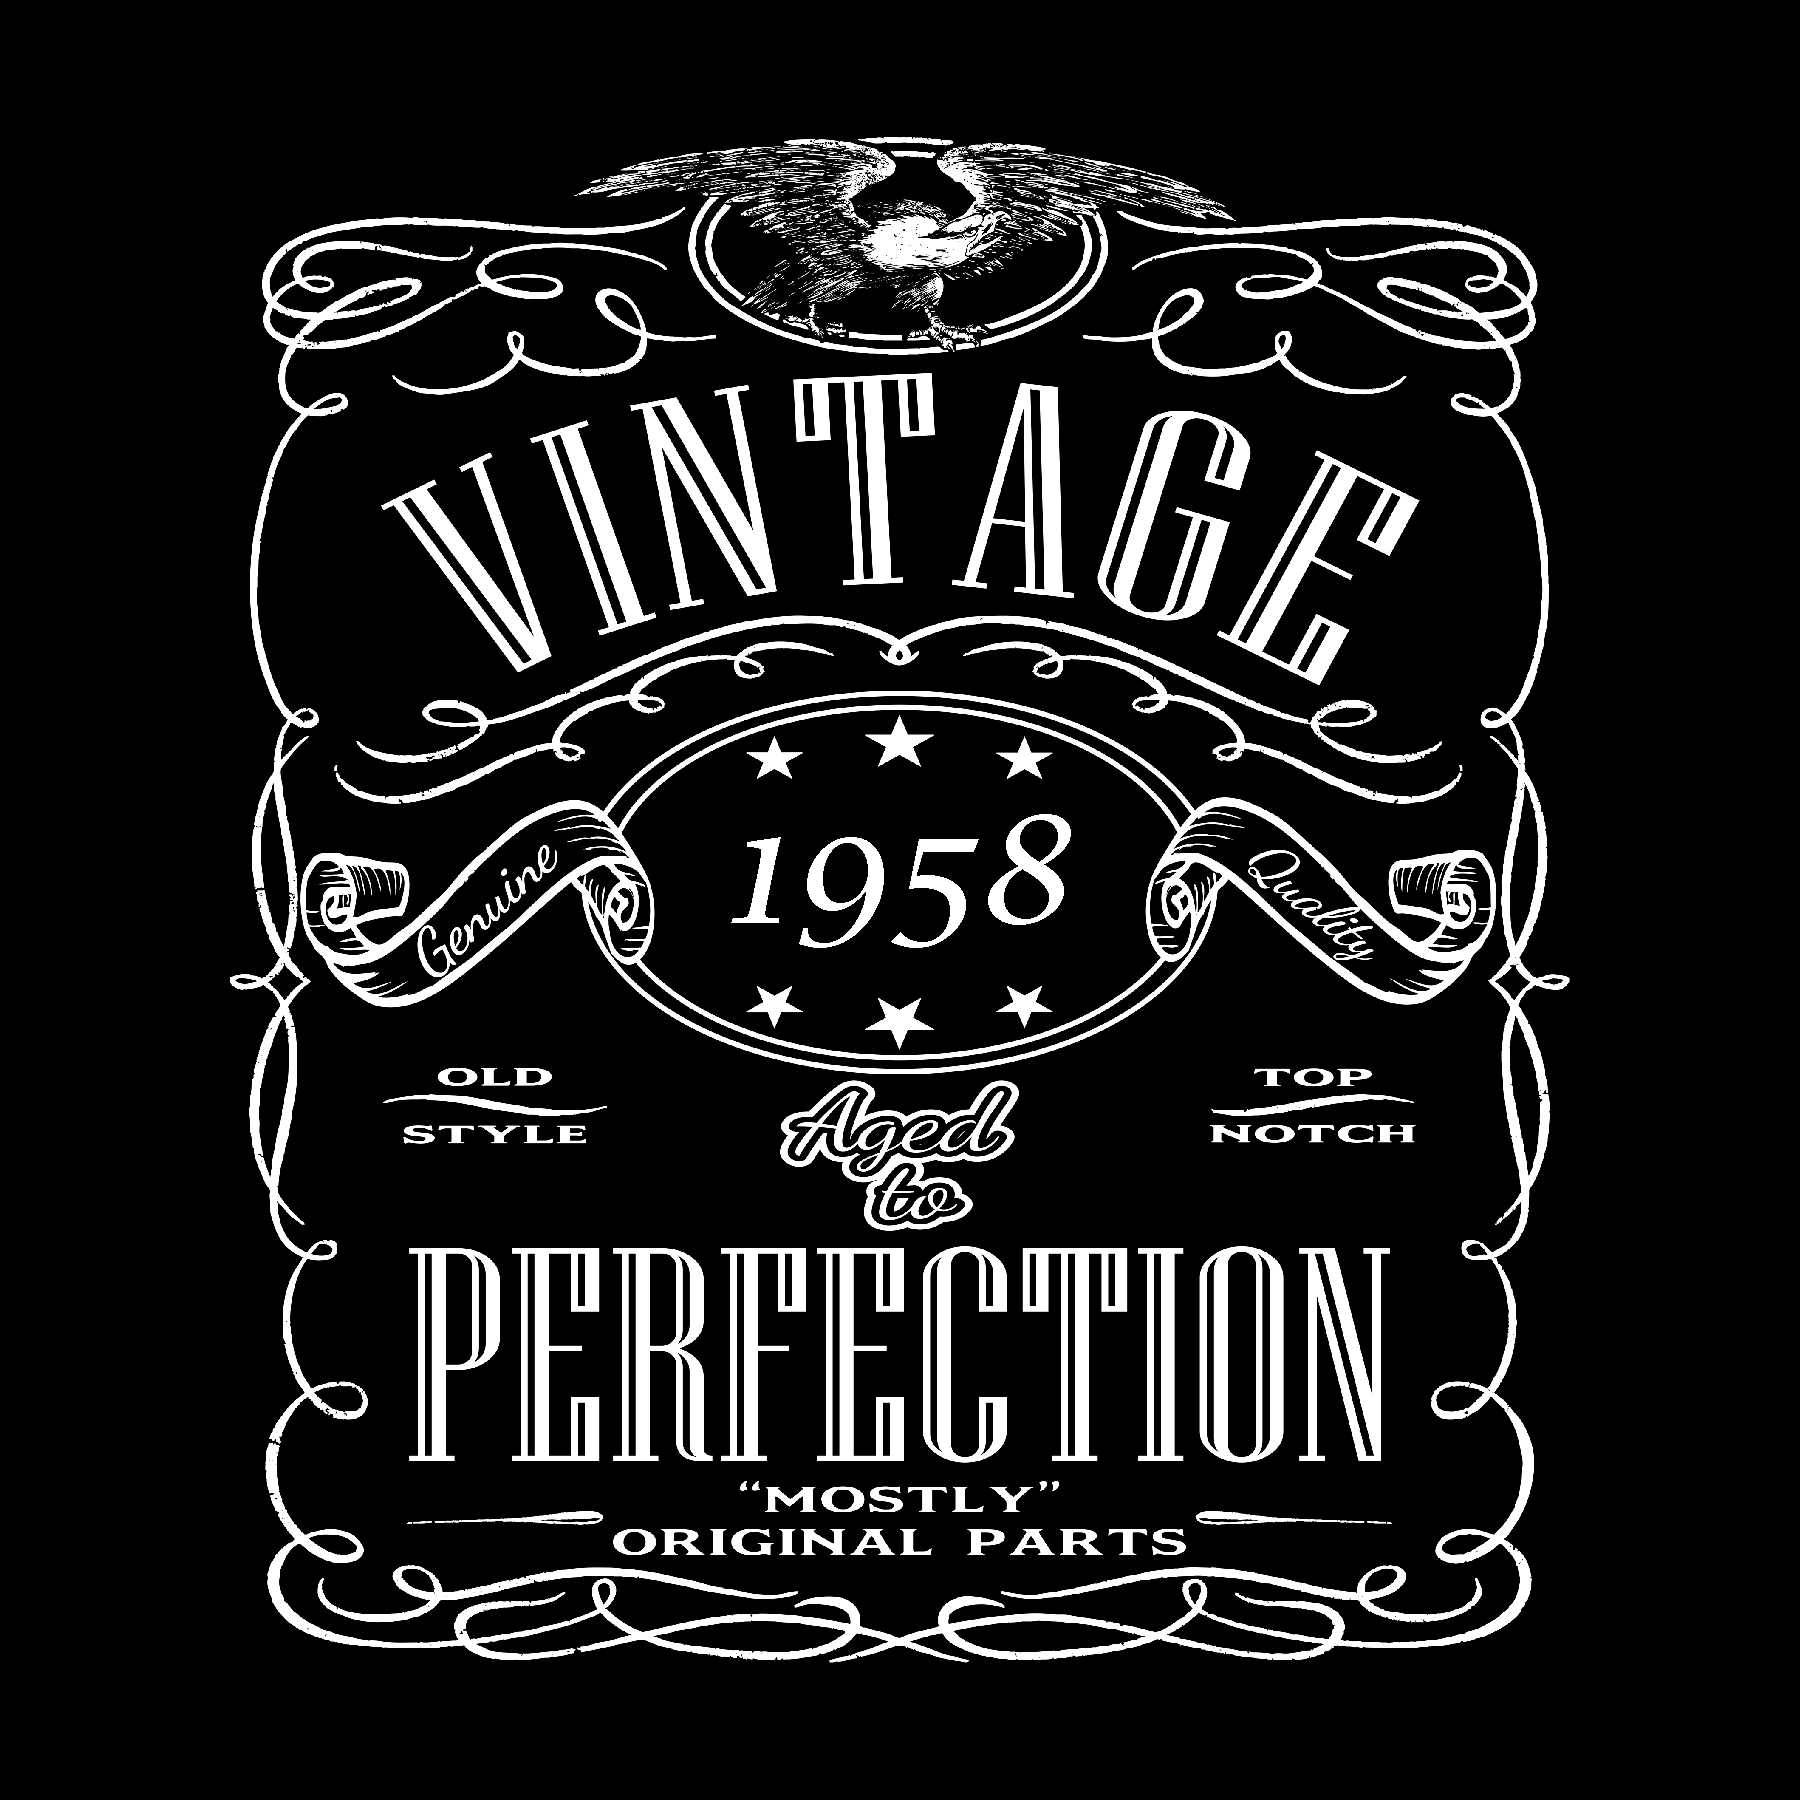 60th birthday shirt born in 1958 birthday shirt 60th birthday